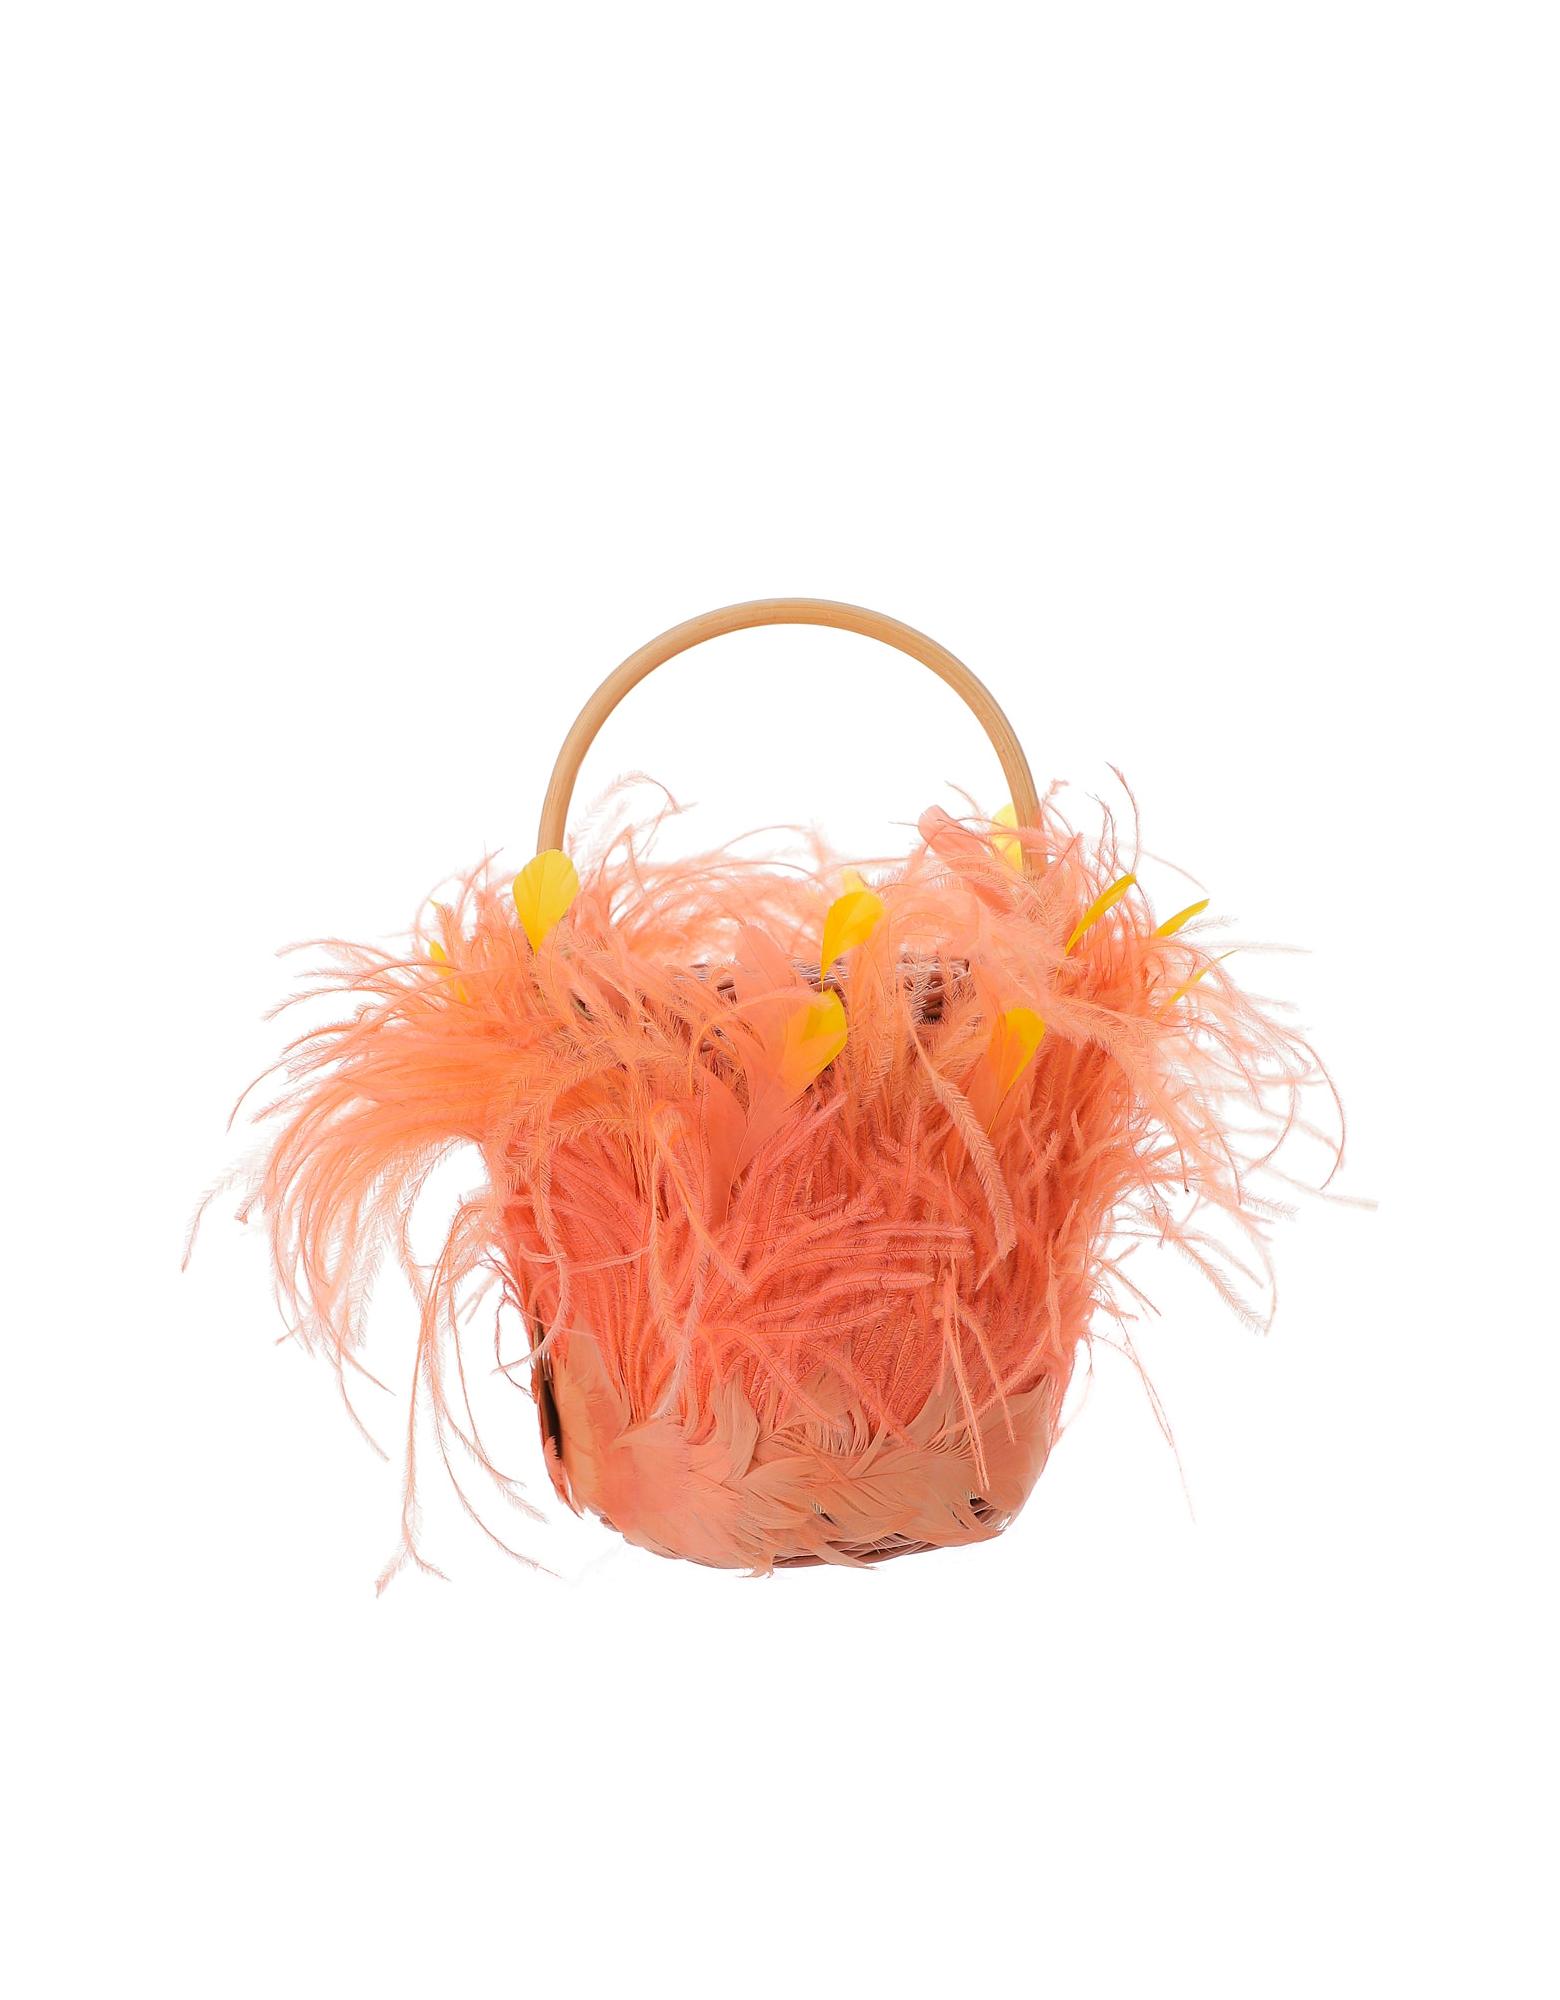 Gatti Designer Handbags, Pink & Orange Feathers Tweety Bag